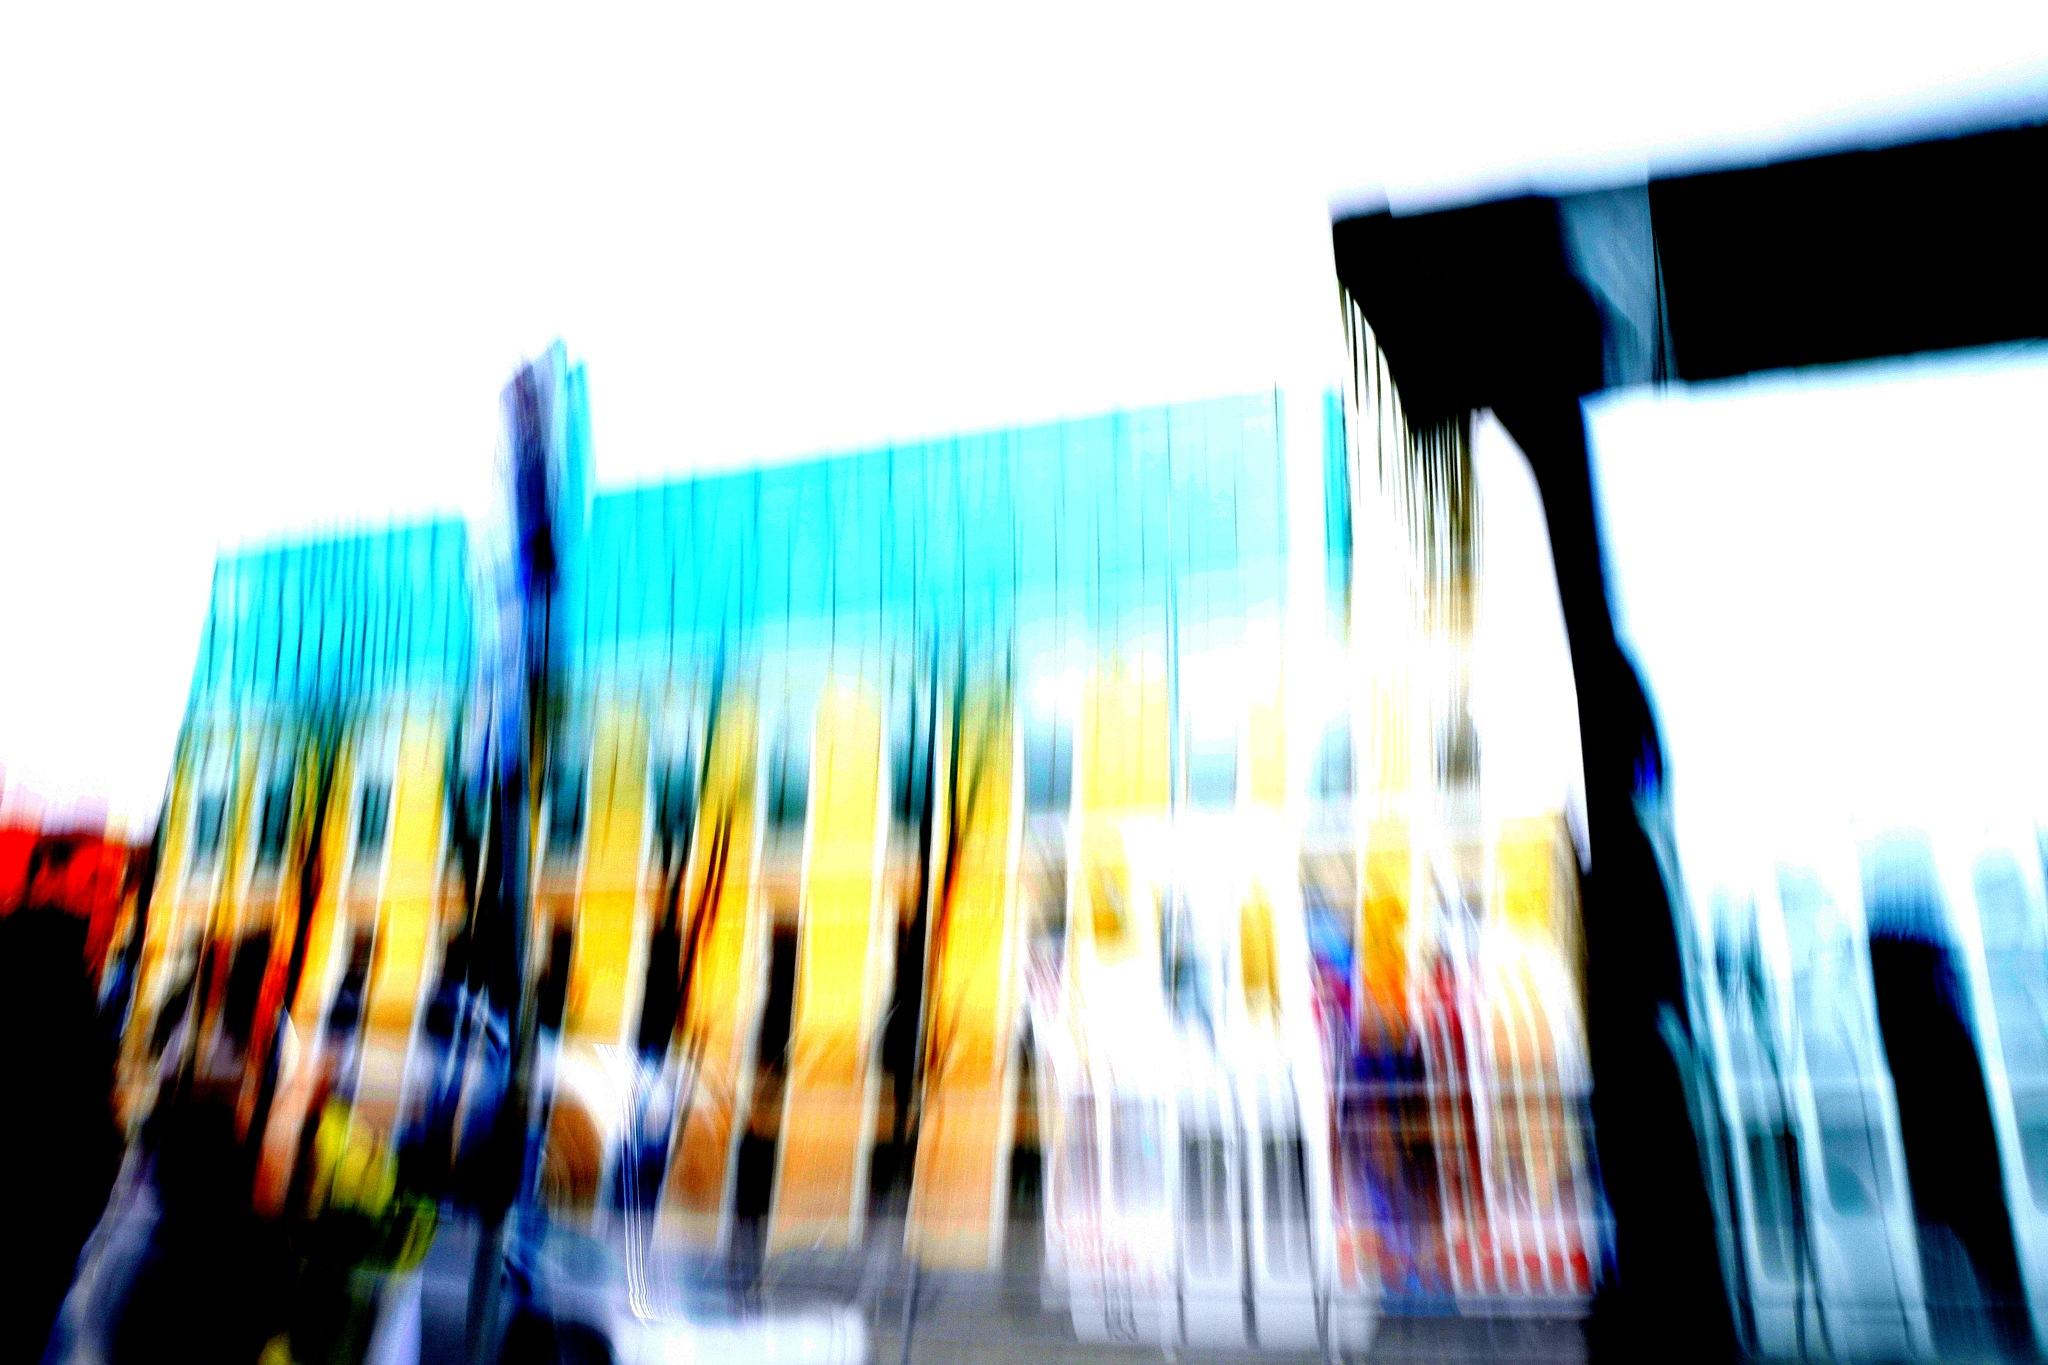 Arkitektur, Tallinn by Lasse Tur